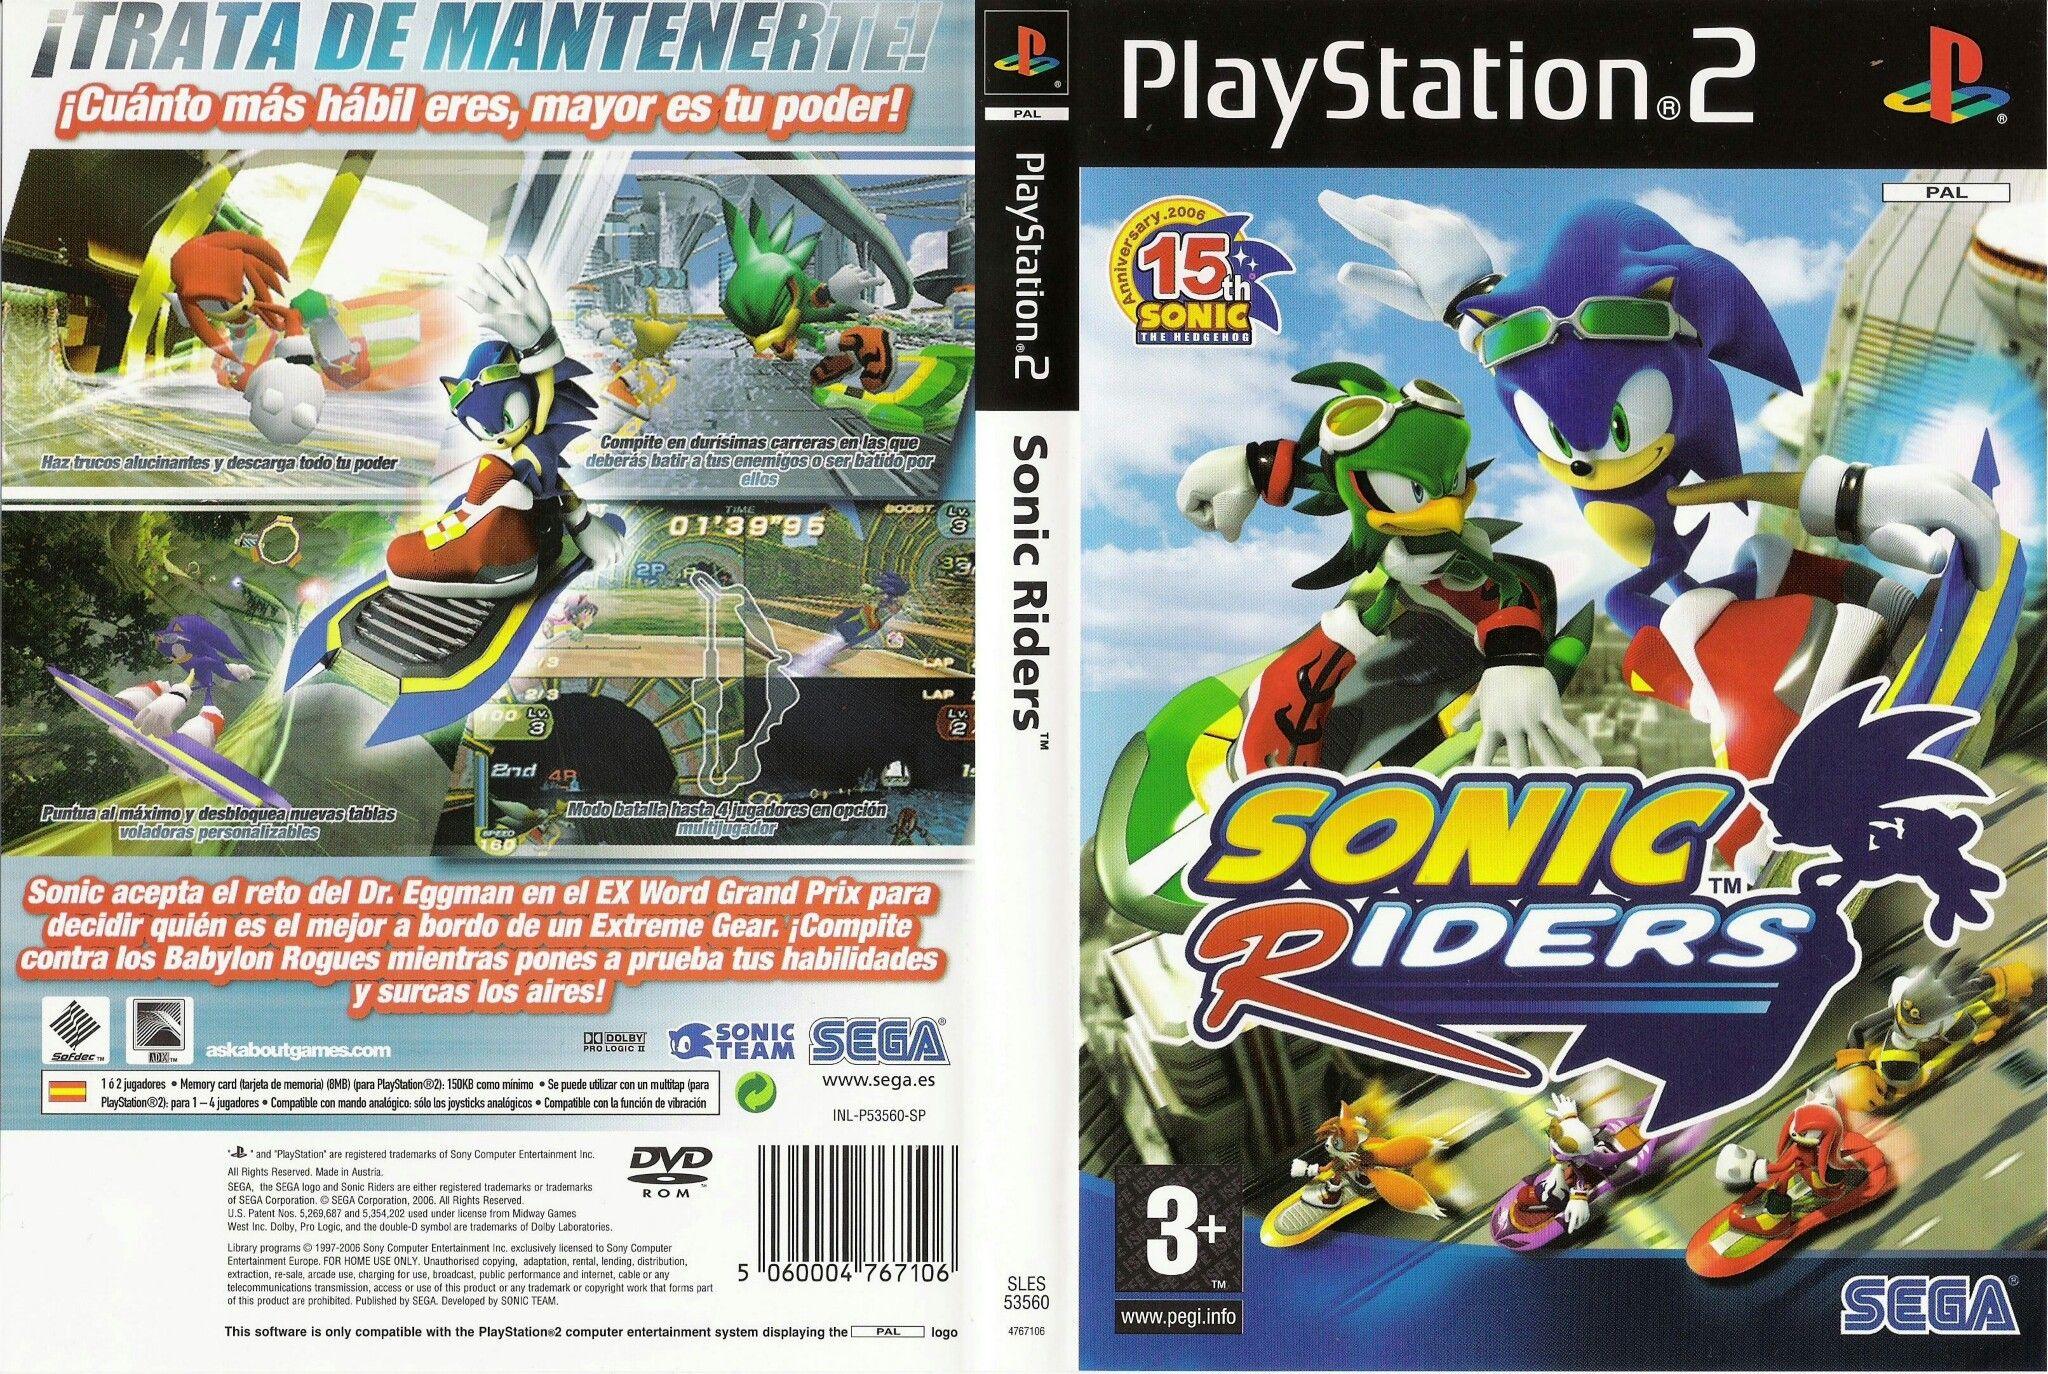 Sonic Riders Playstation Sonic Riders Playstation 2